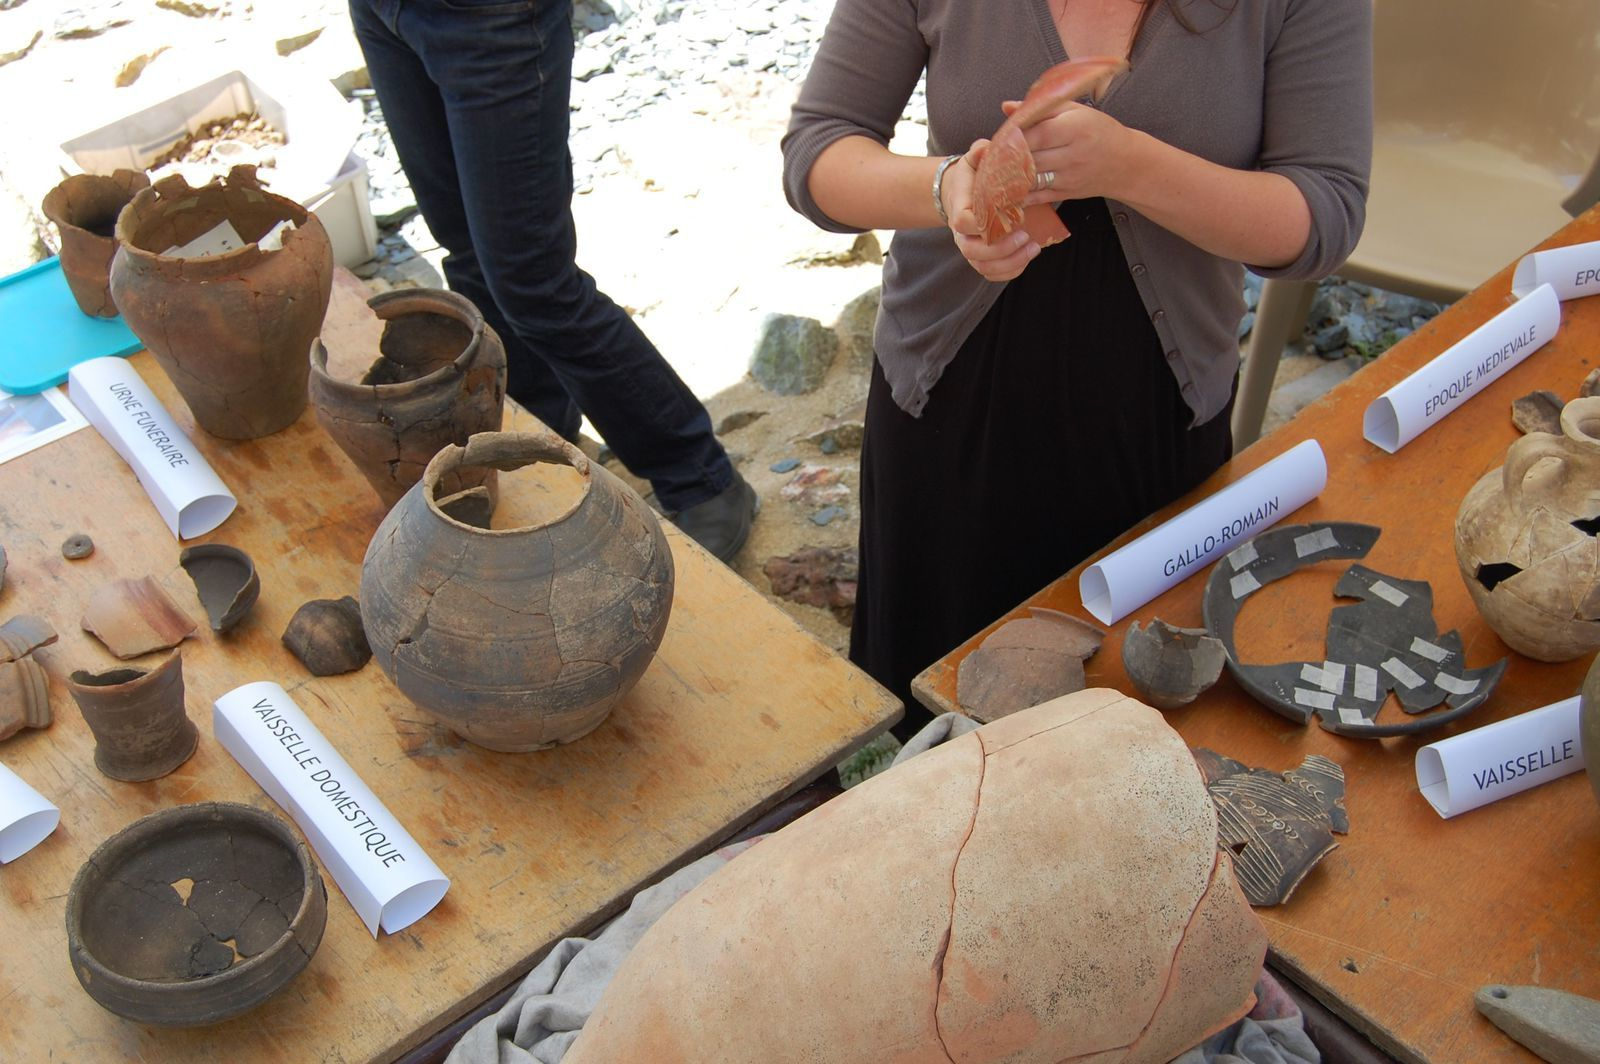 #JNA14, l'archéologie version audio